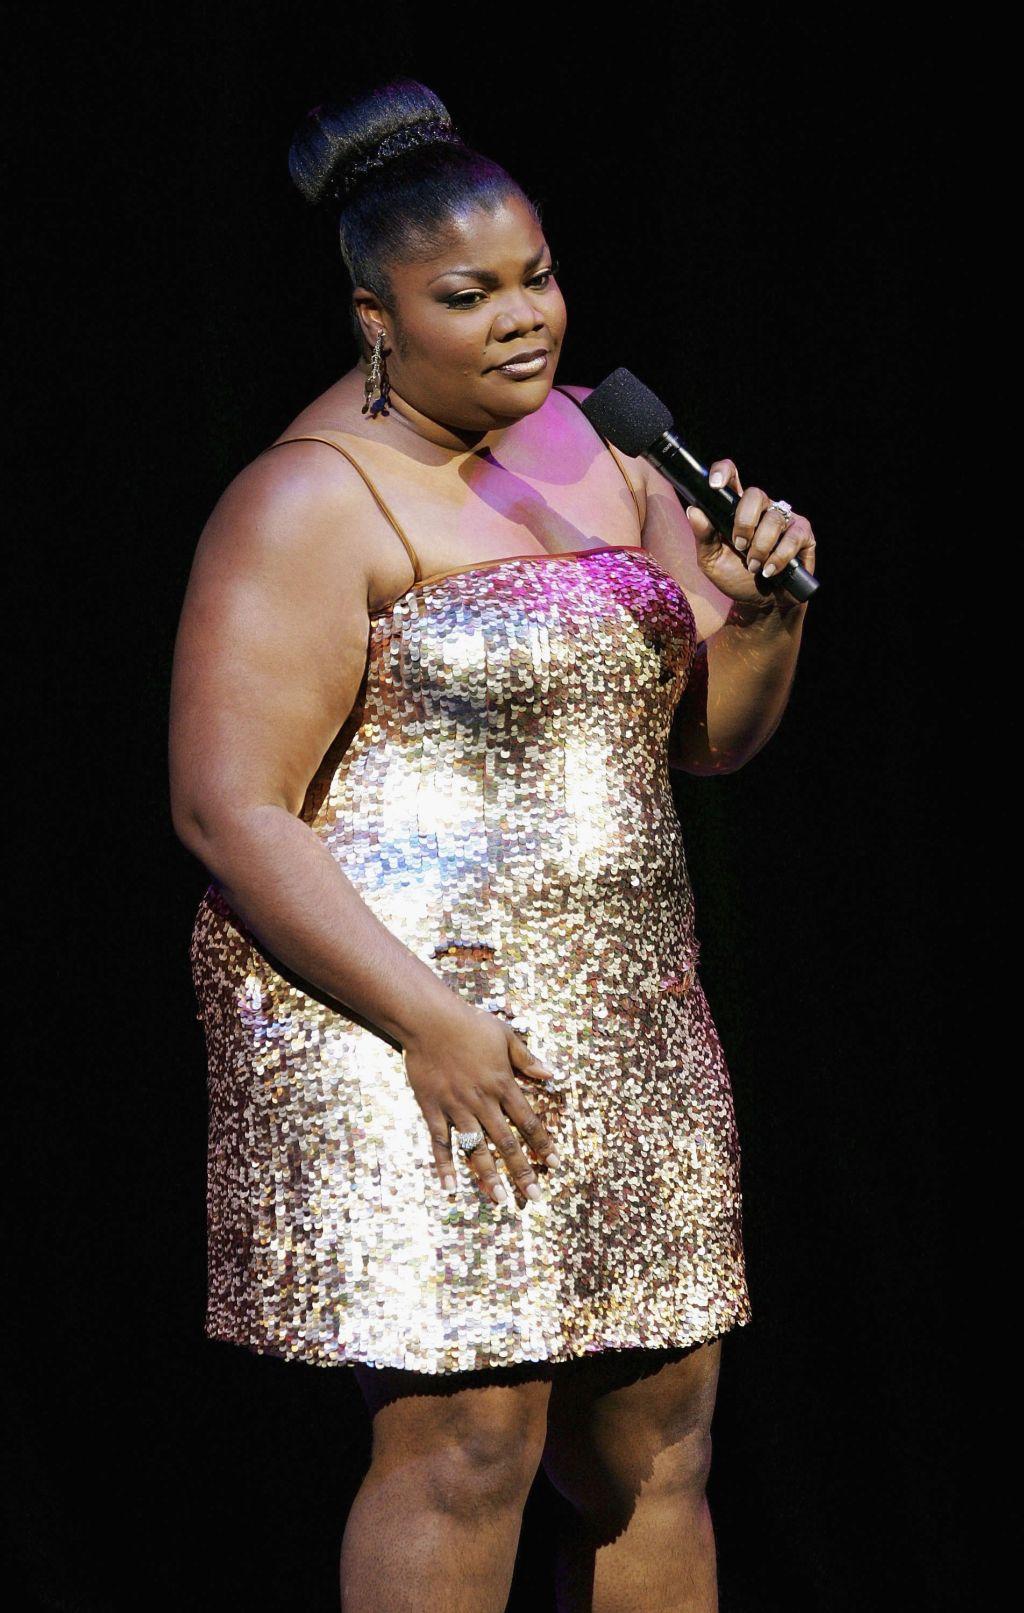 Monique Weight Loss 2016 : monique, weight, Mo'Nique, Celebrates, Being, Under, Pounds